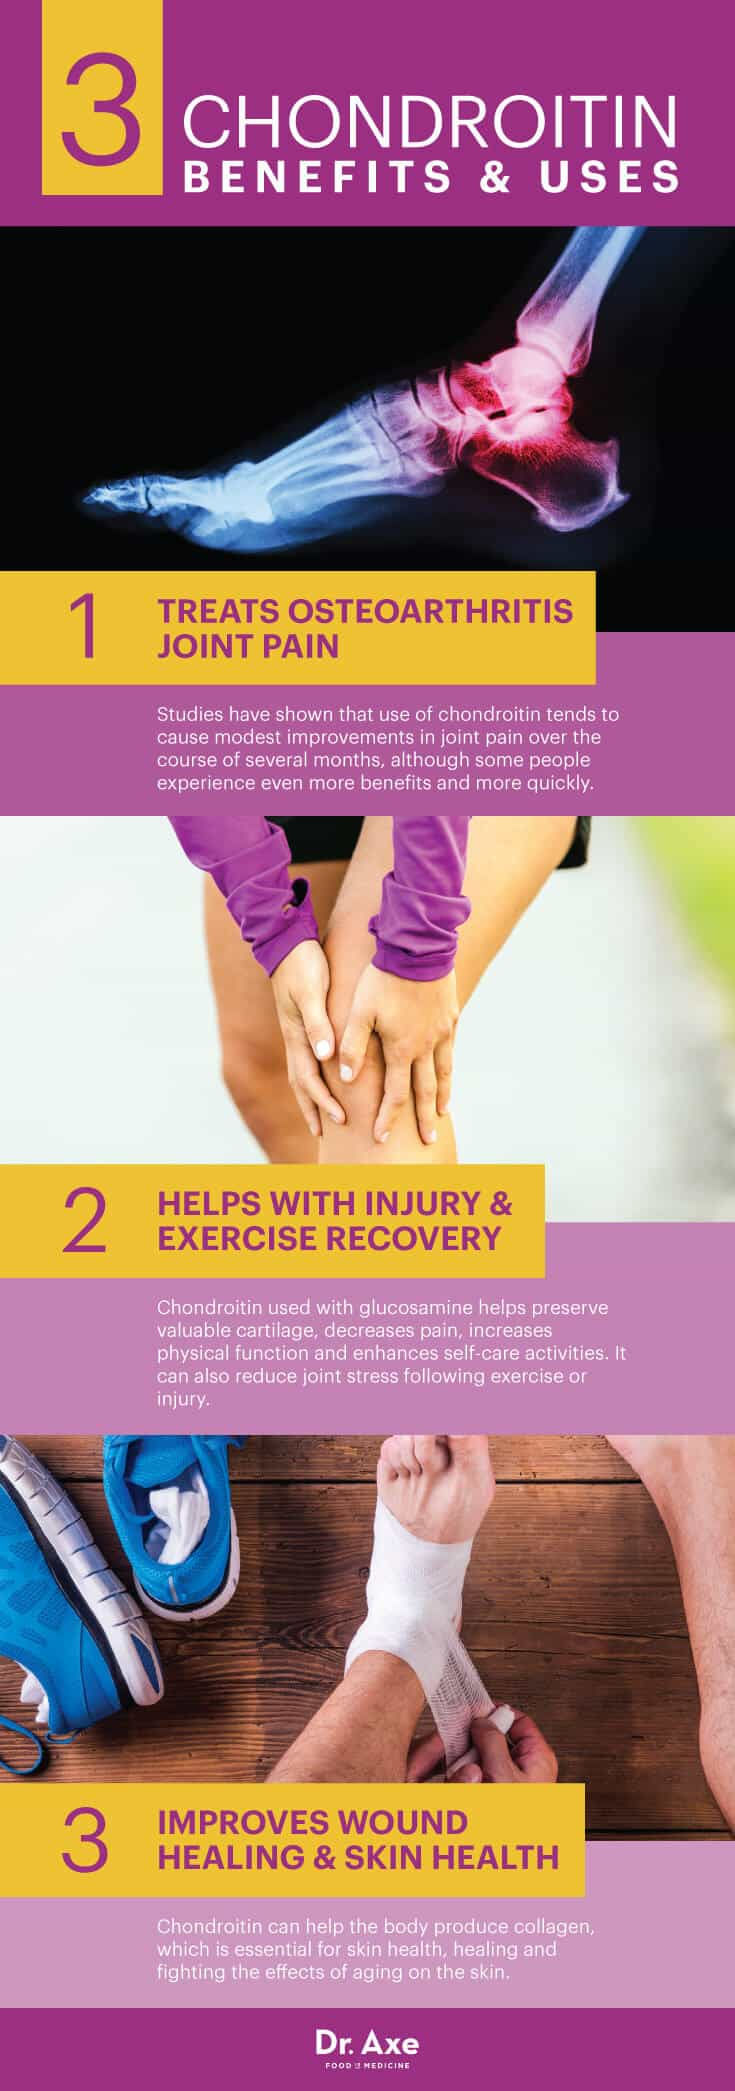 Chondroitin benefits - Dr. Axe